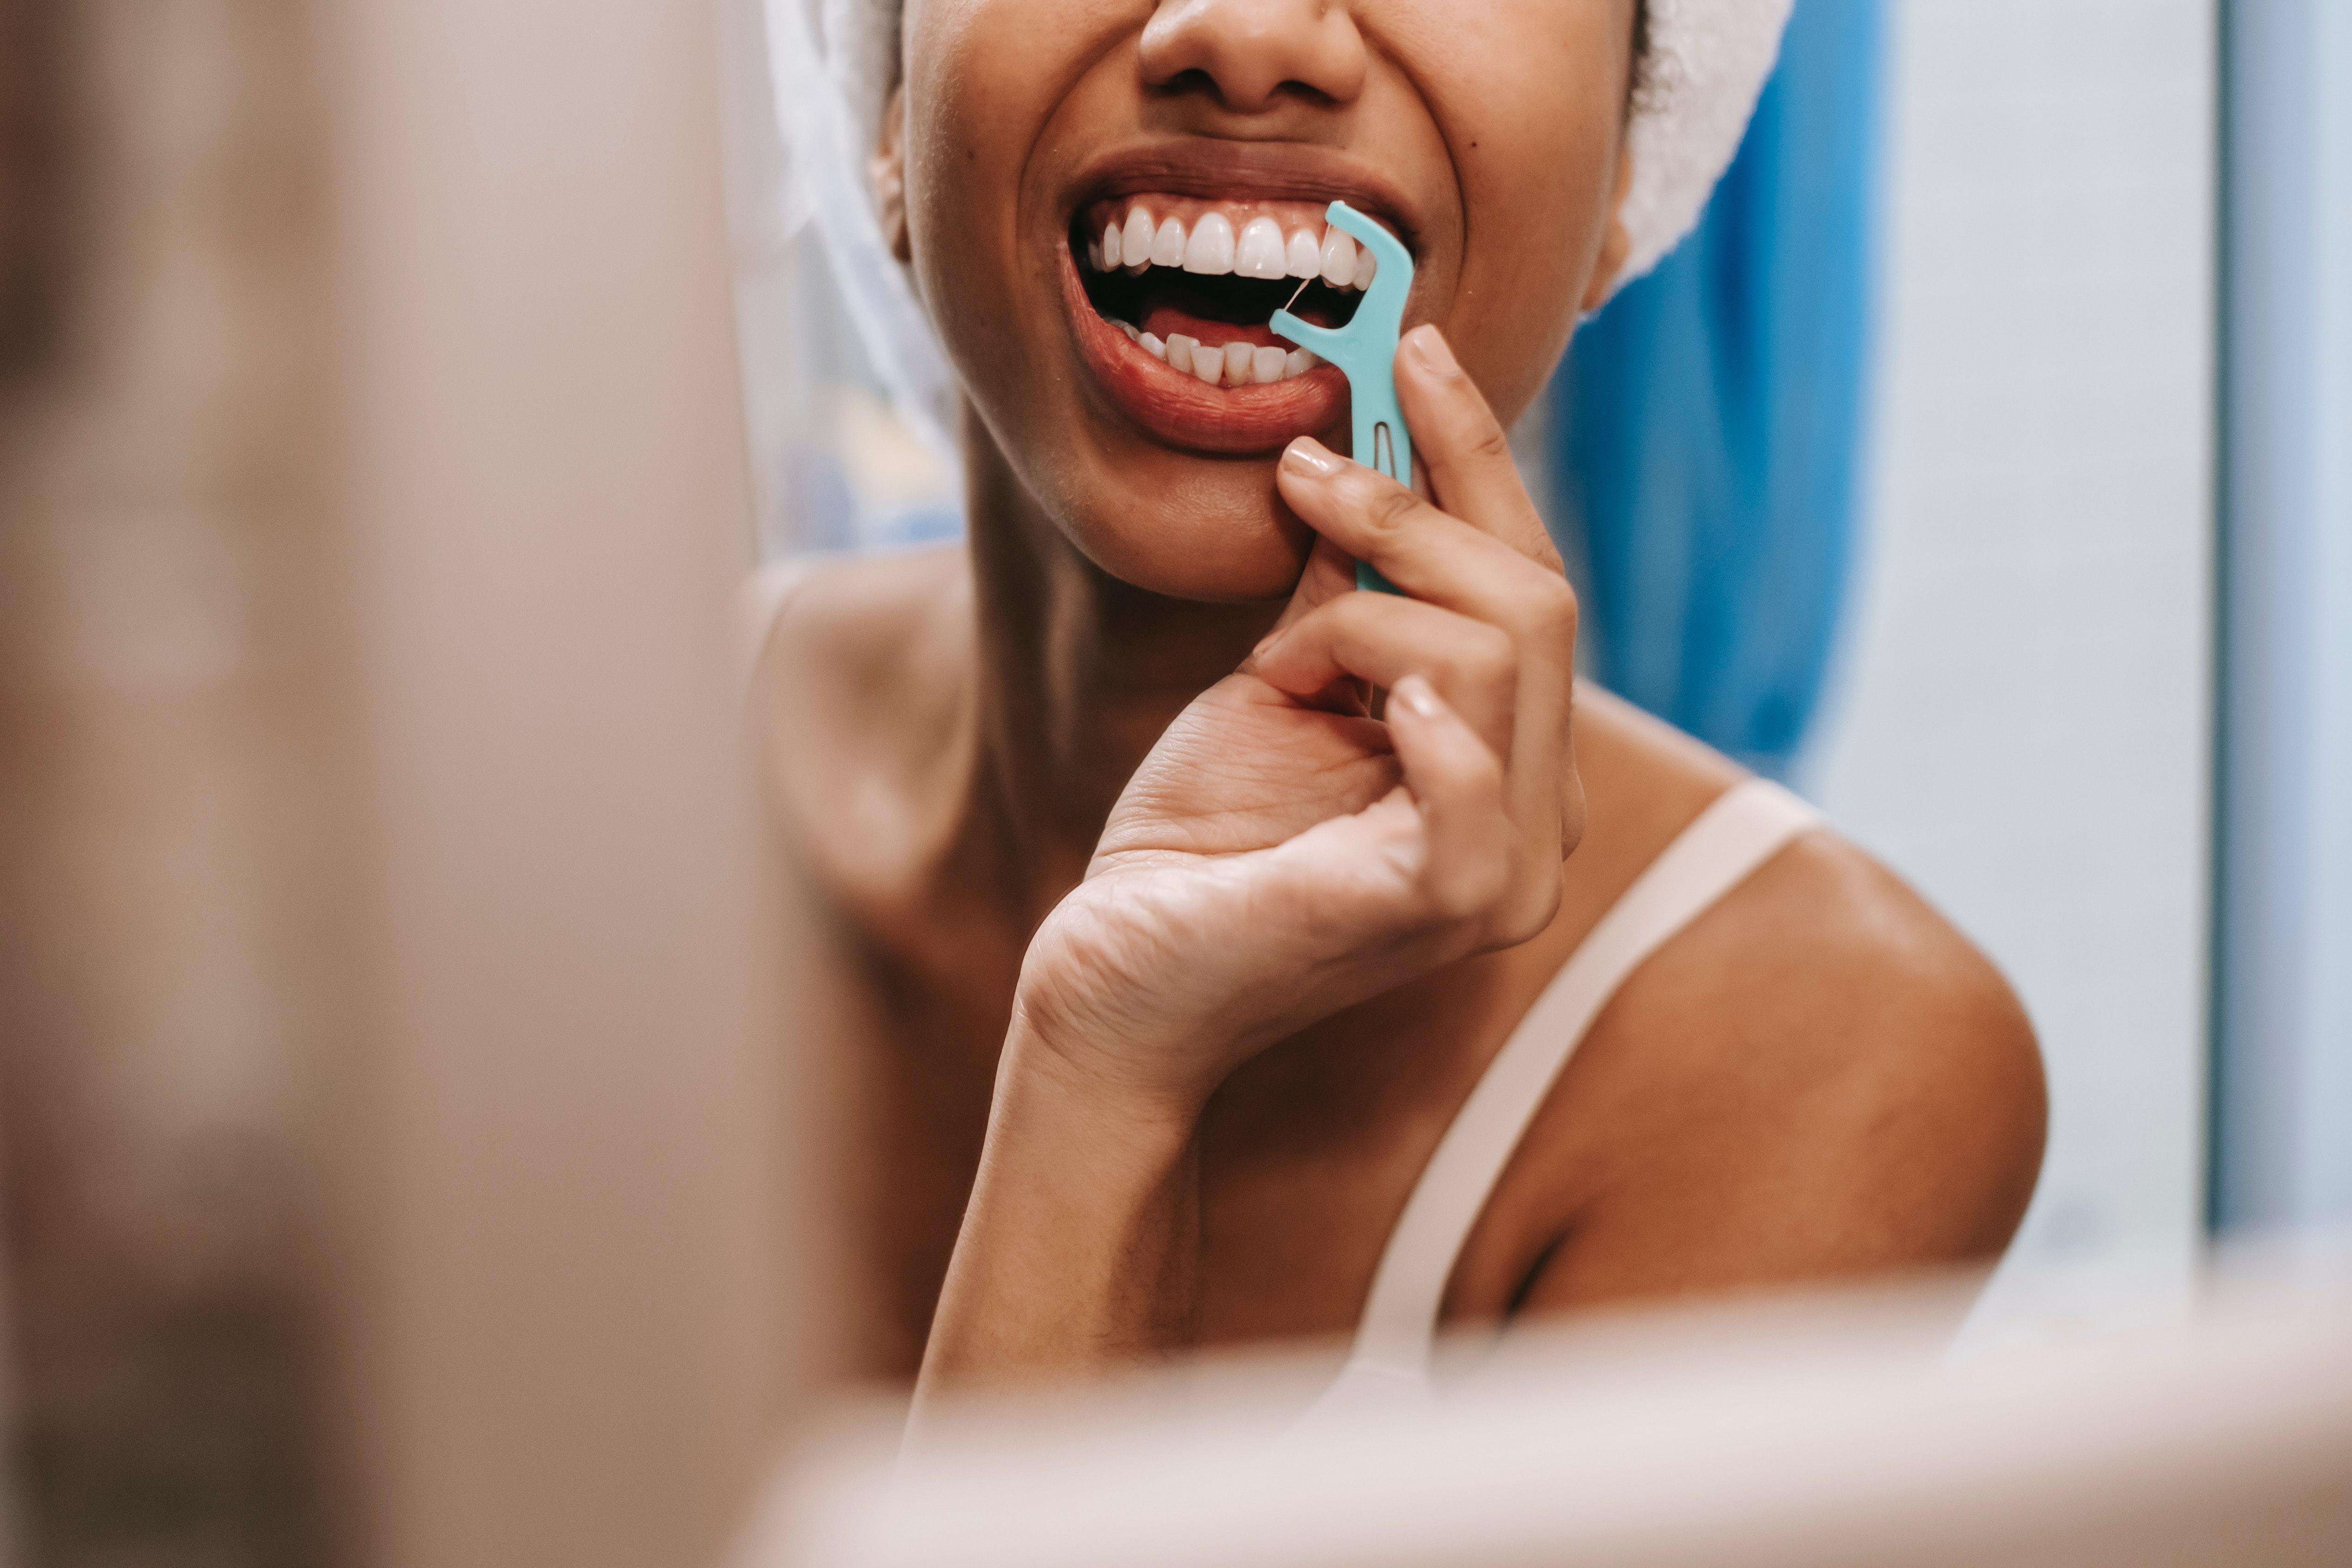 teeth whitening, teeth whiten, oral health, dental care, oral hygiene